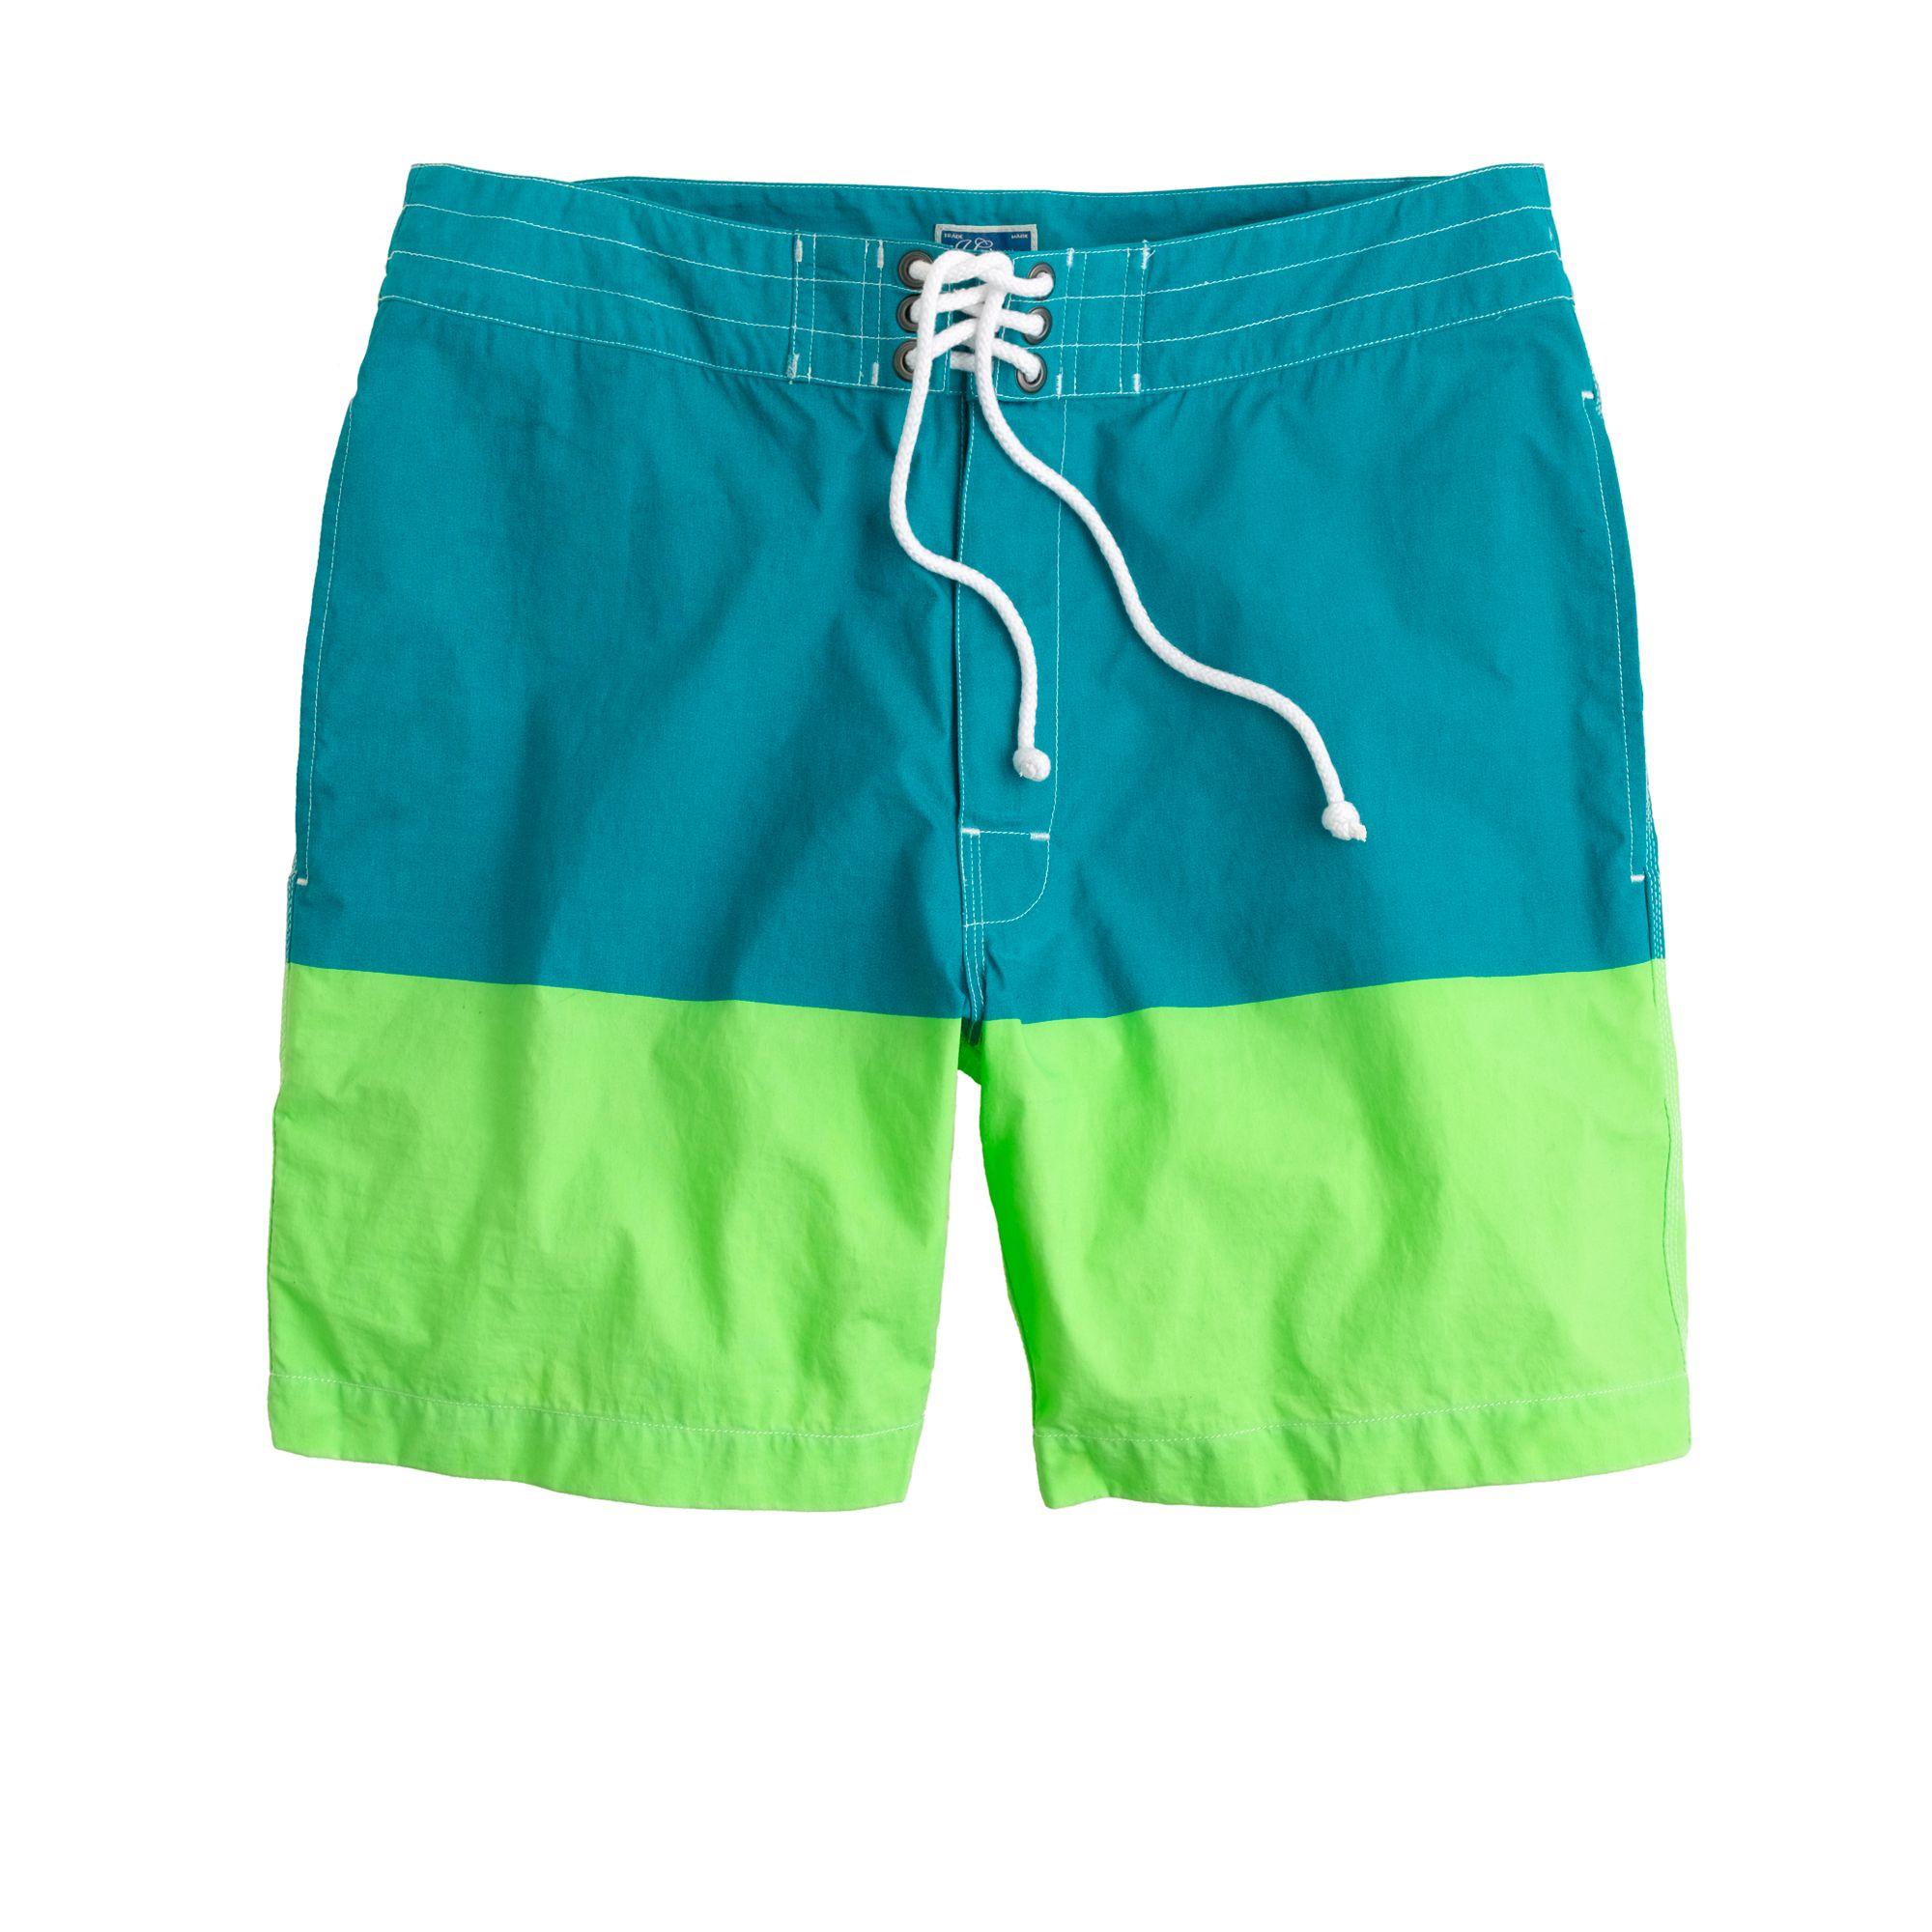 9e3c268159 J.Crew 7 Board Shorts in Colorblock in Green for Men - Lyst